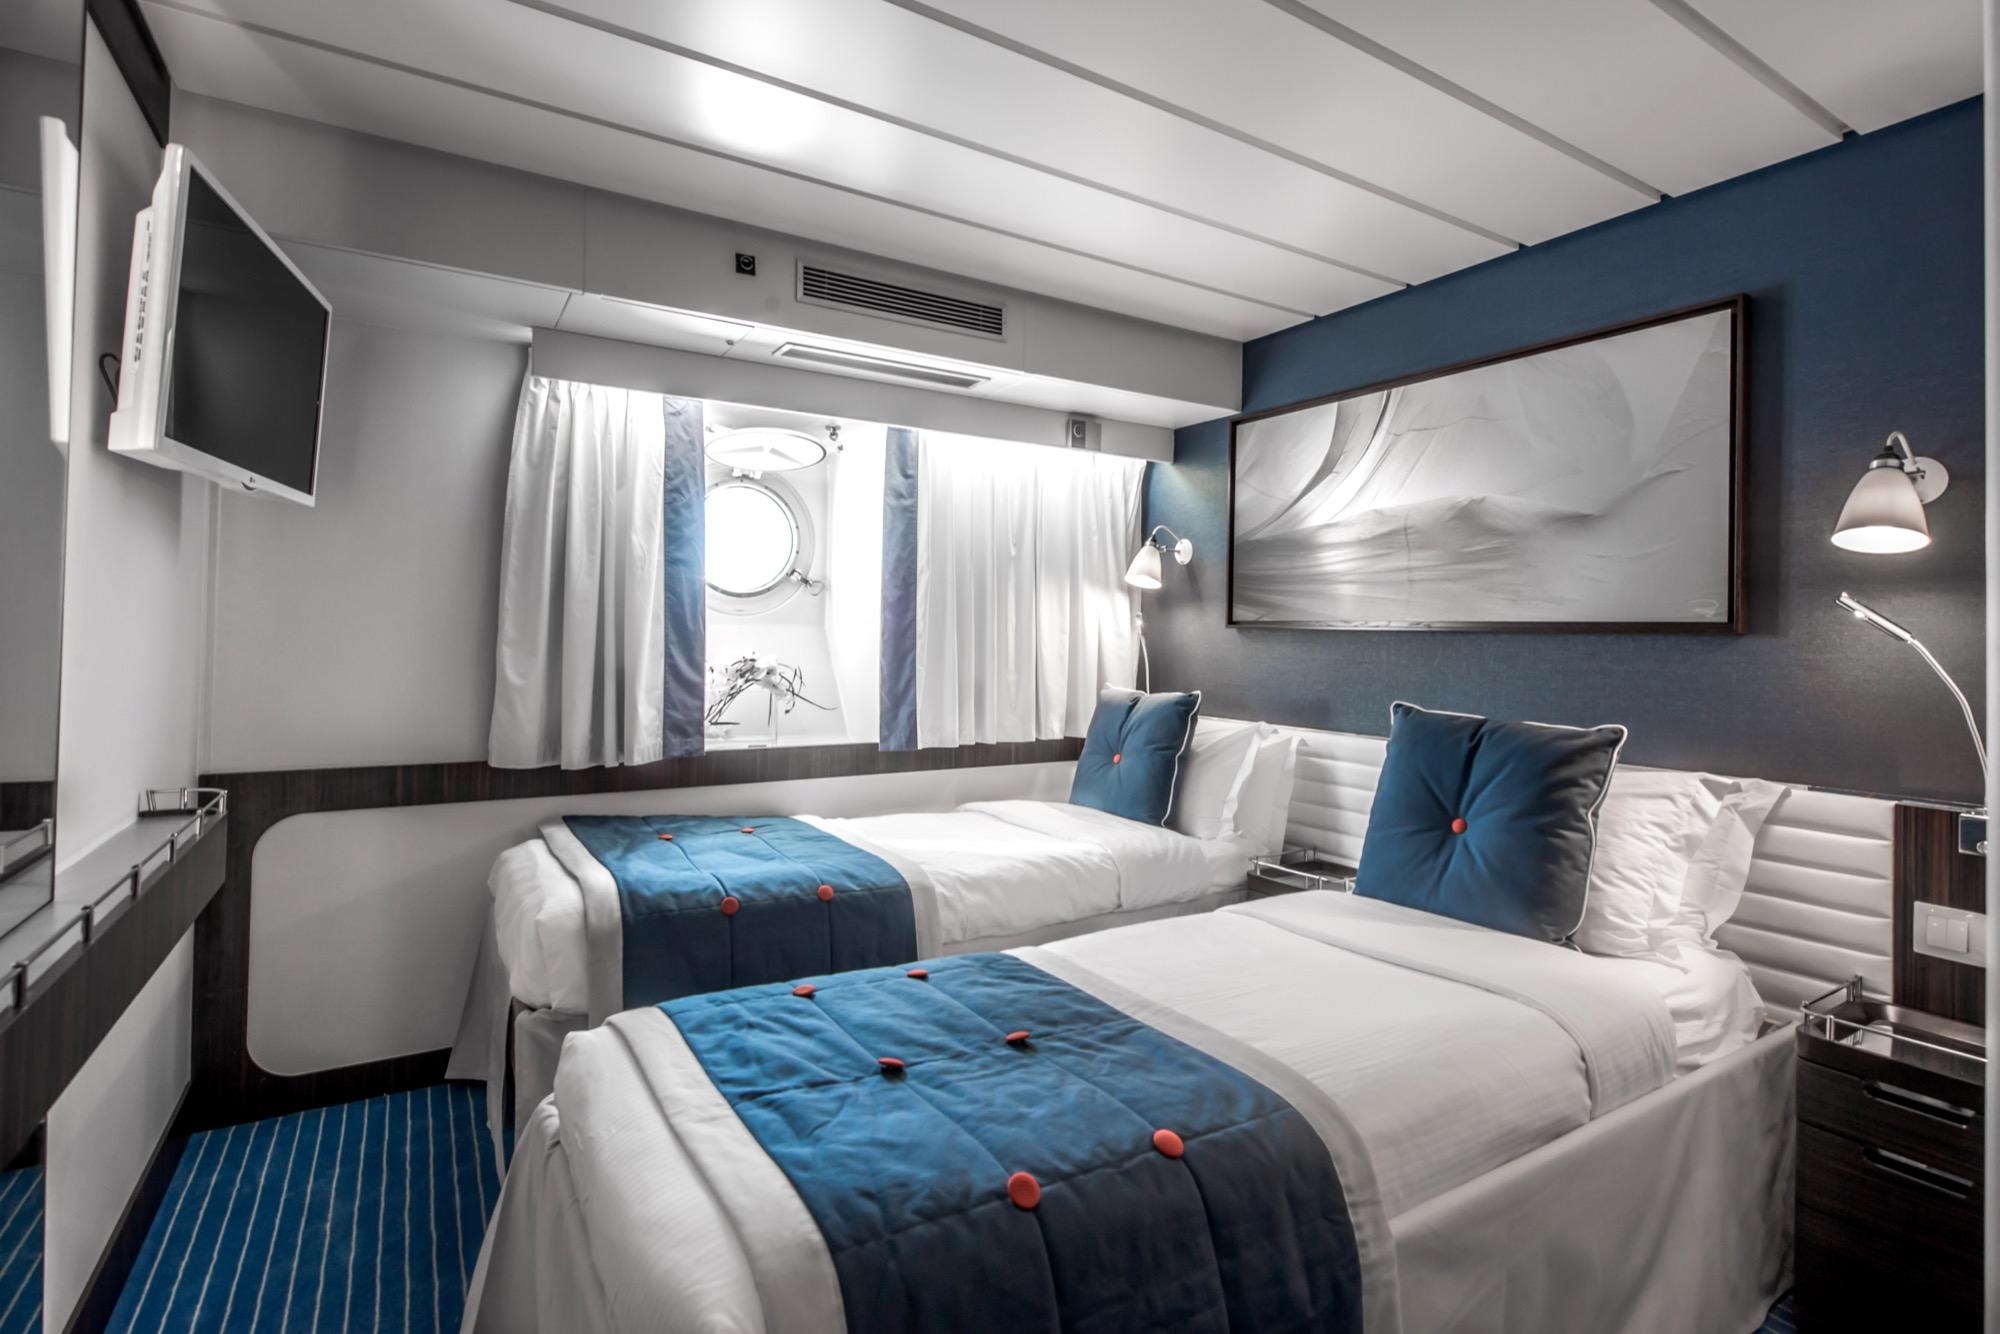 Ponant Le Ponant Accommodation Marie-Galante Deck Stateroom Twin.JPEG